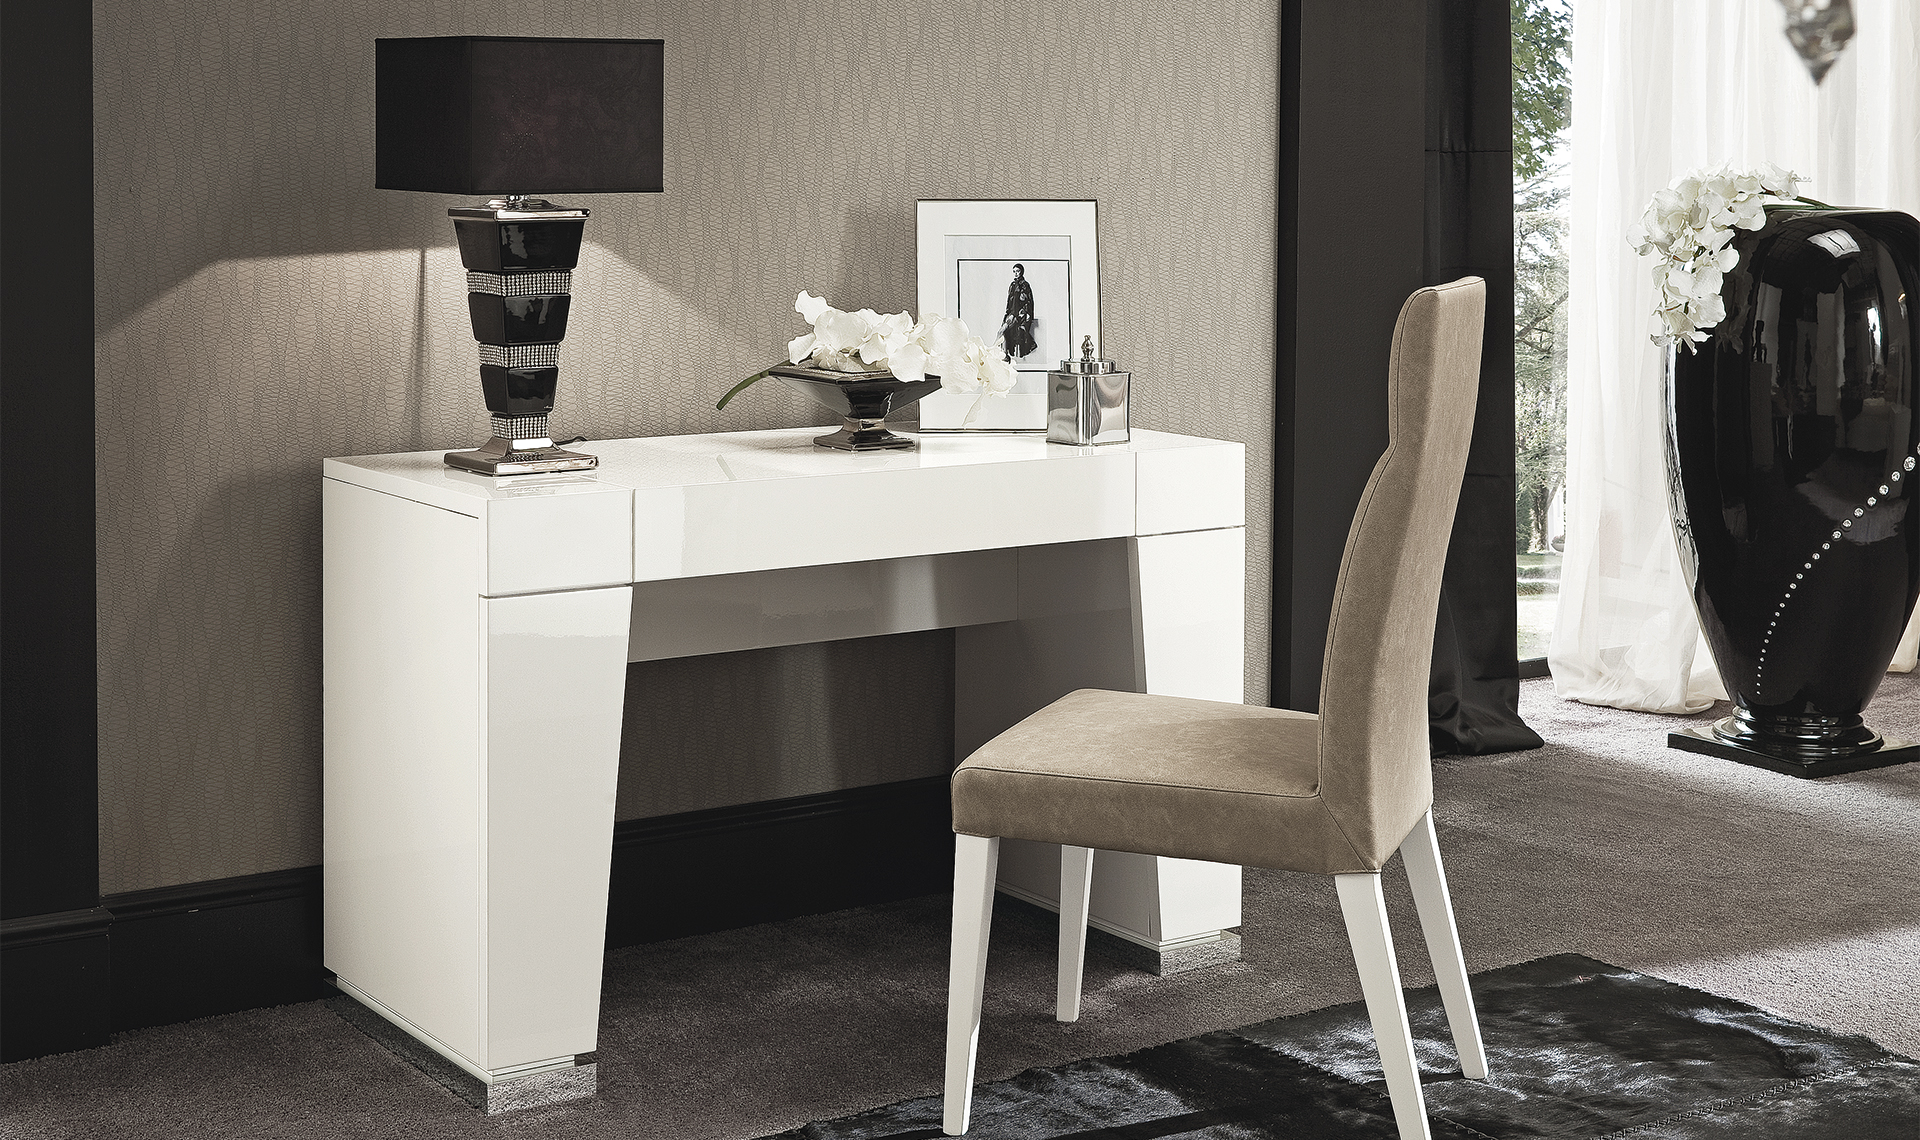 Canova Bedroom Vanity & Chair